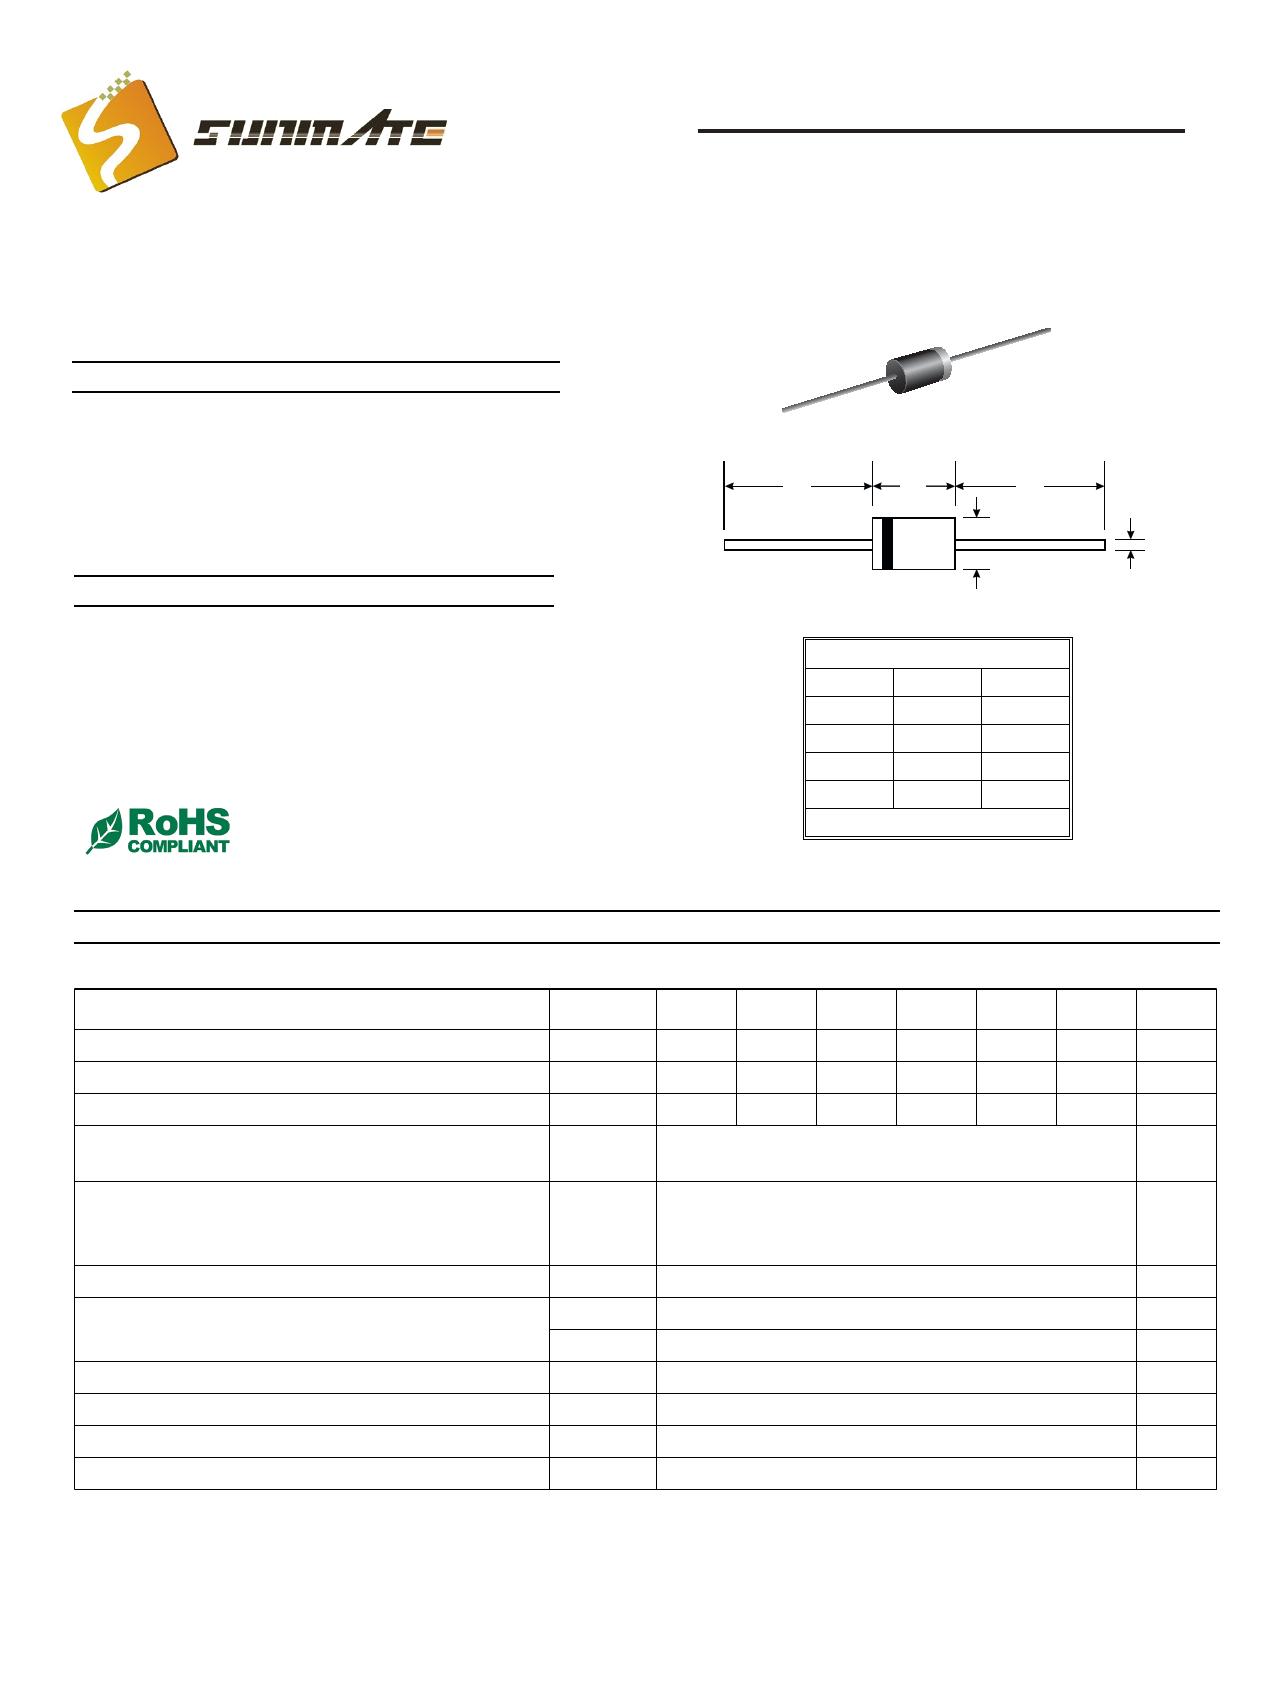 MR852 데이터시트 및 MR852 PDF